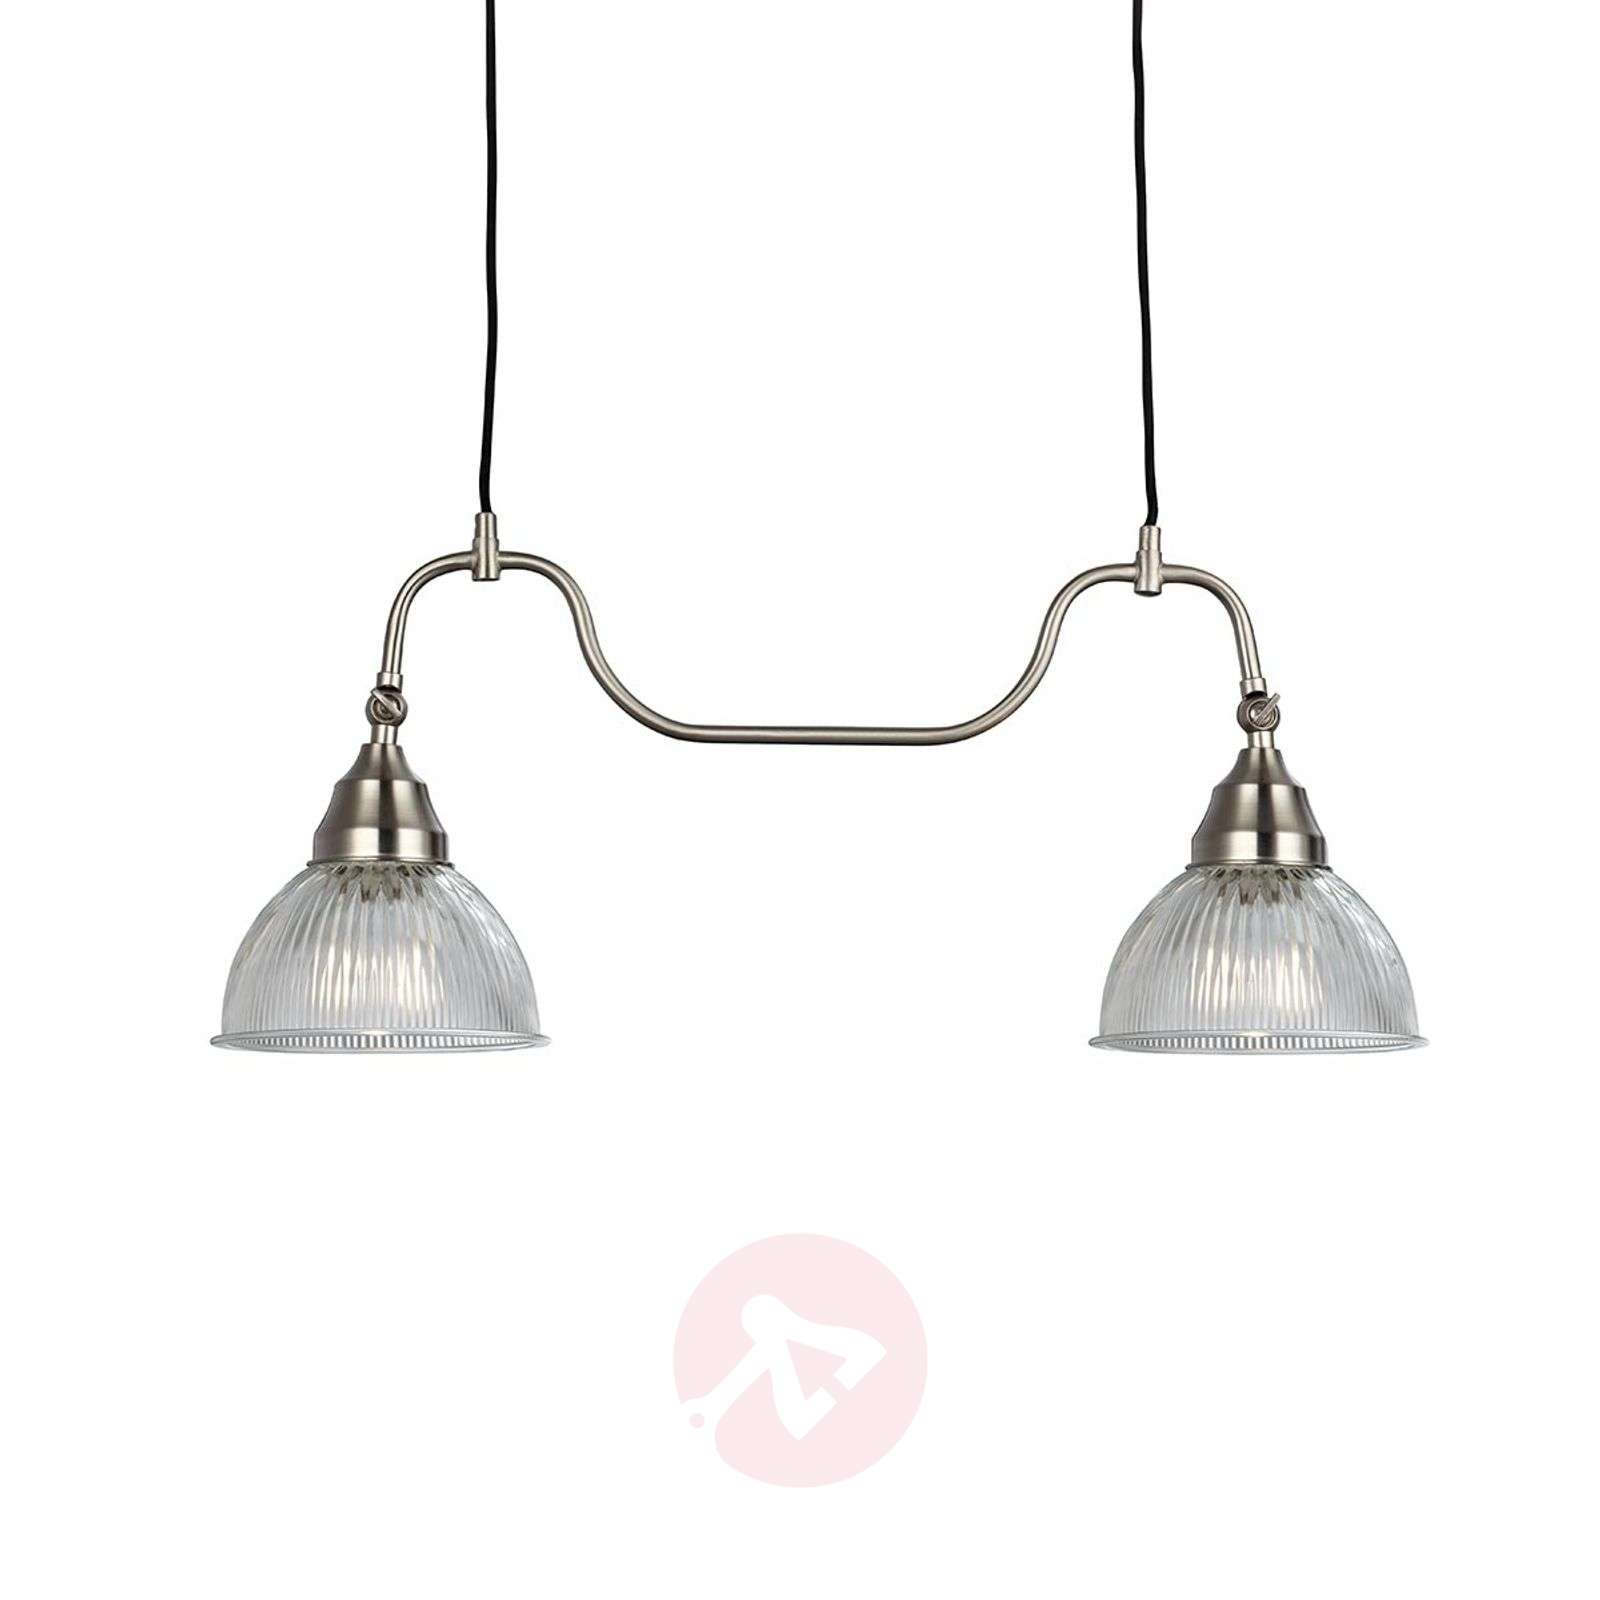 2-bulb Asnen Nordic hanging light-6506076-01